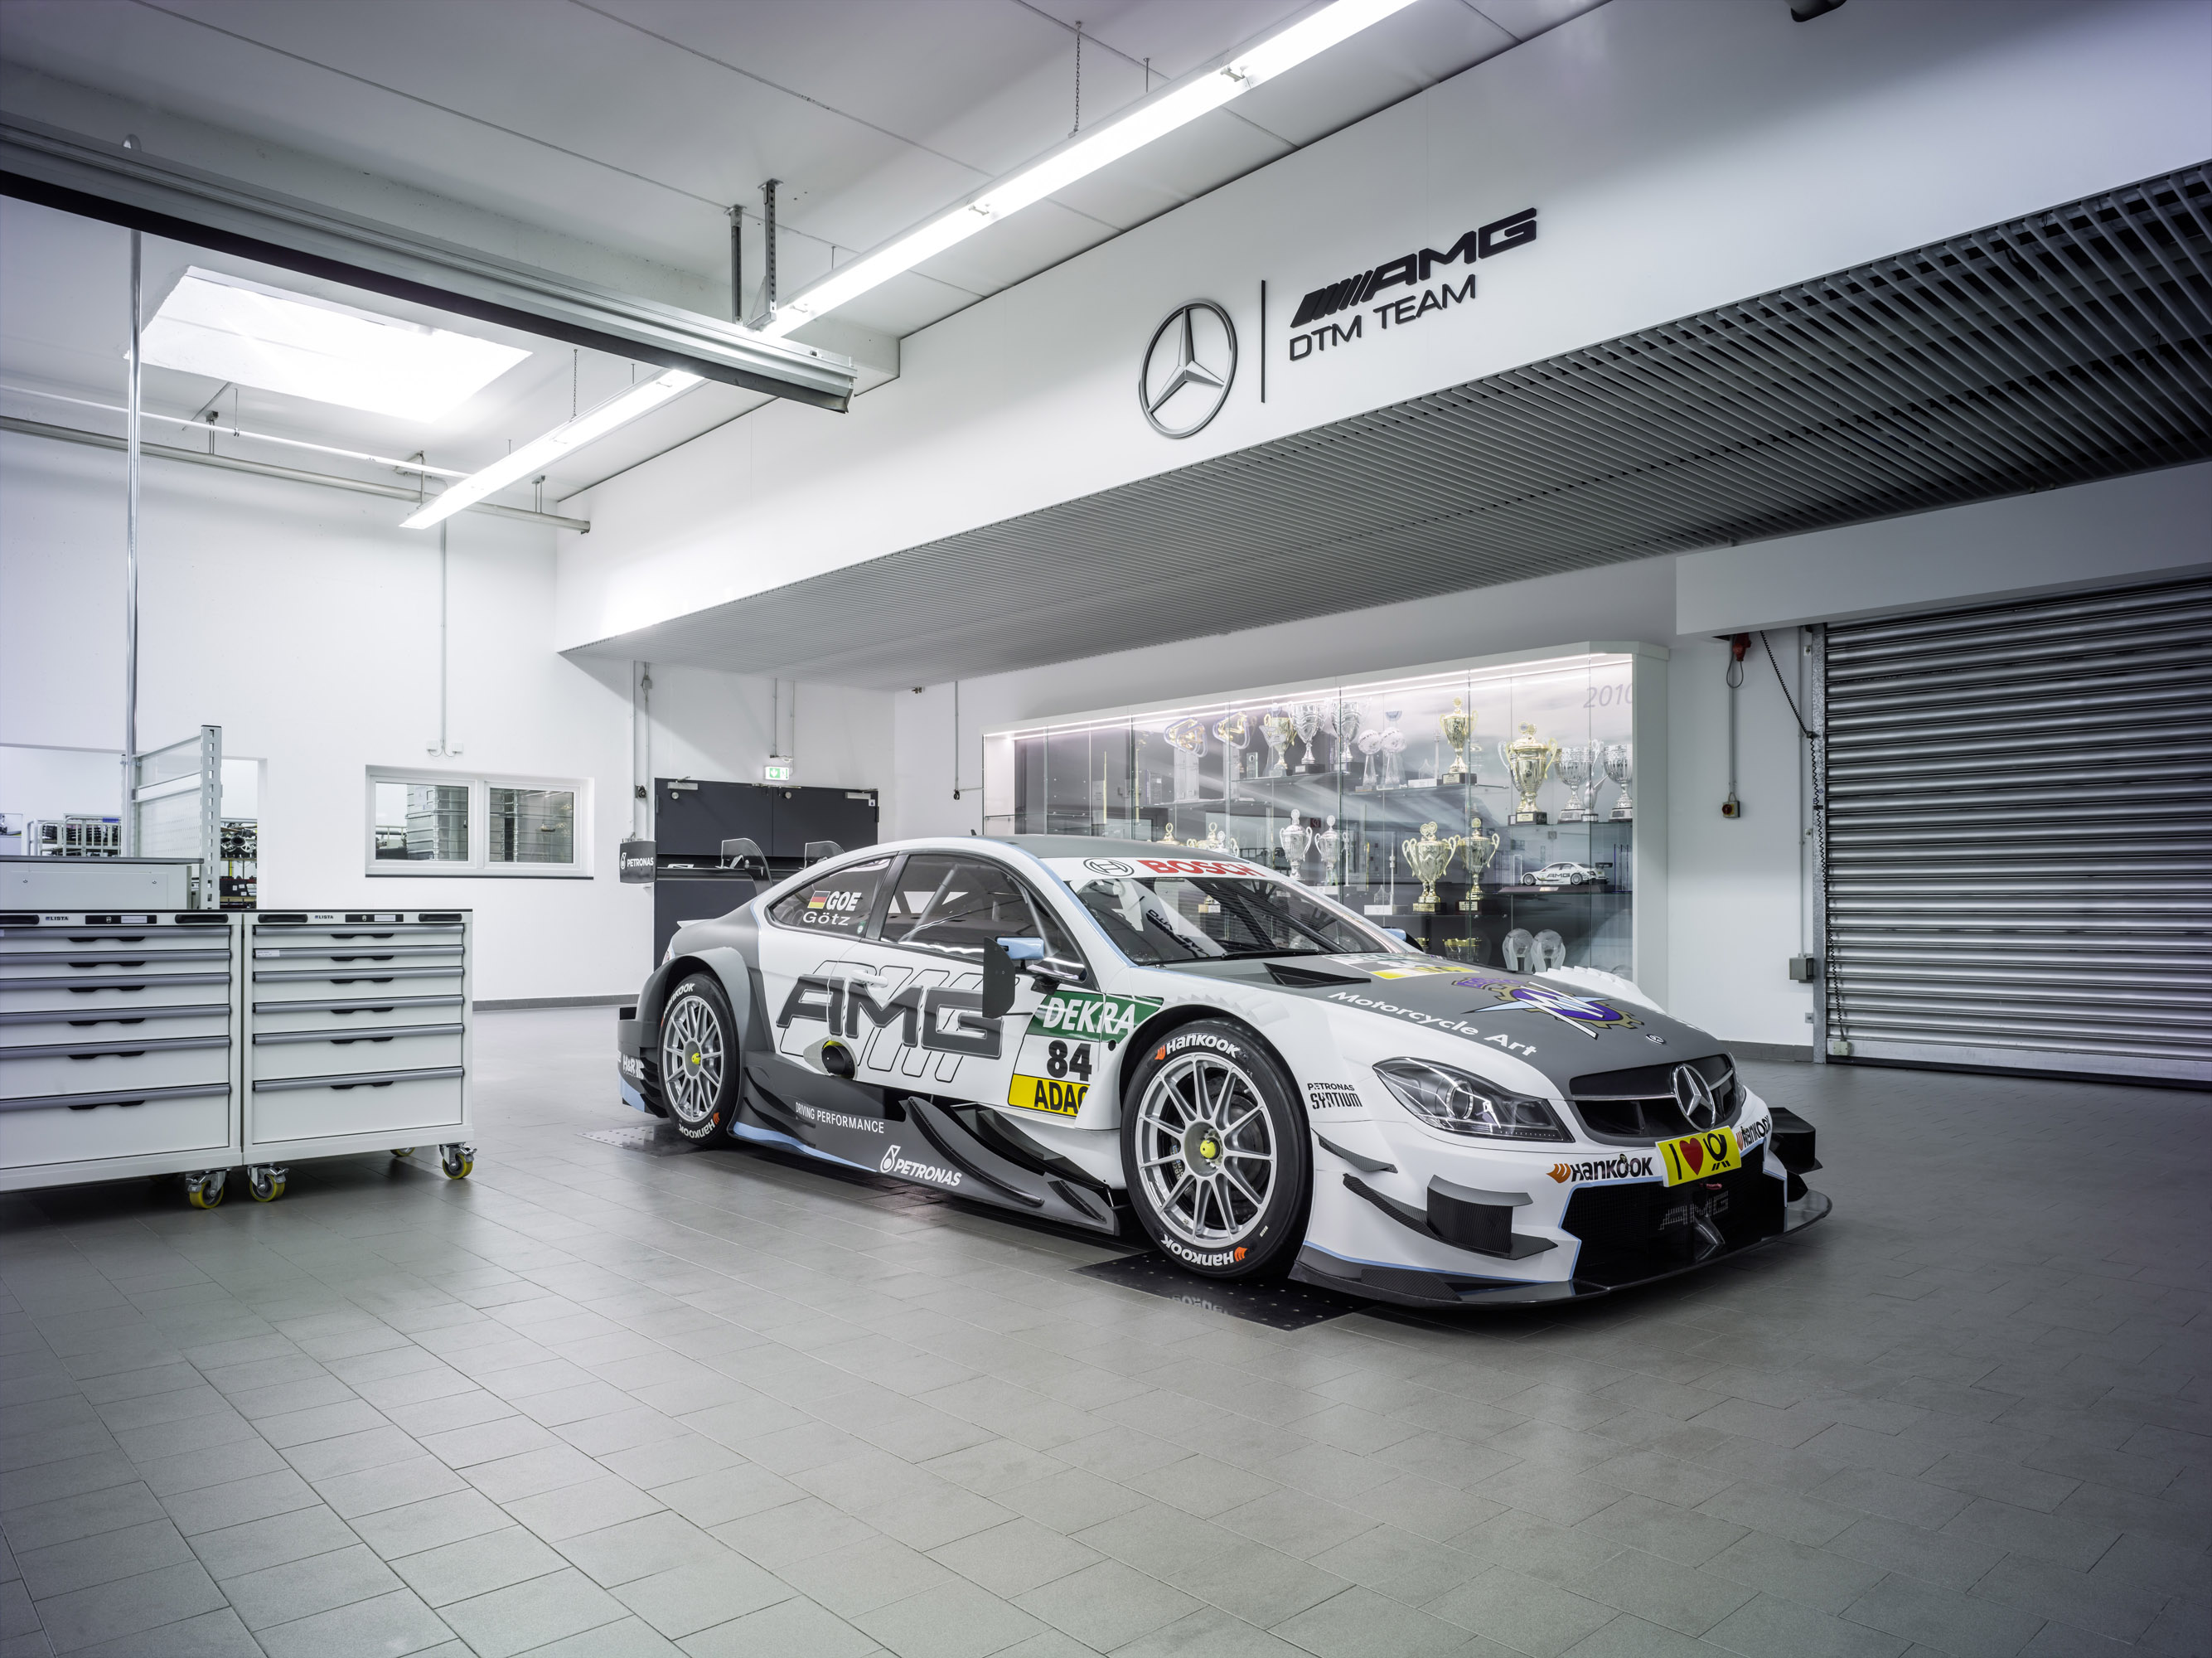 Best Race Car Companies